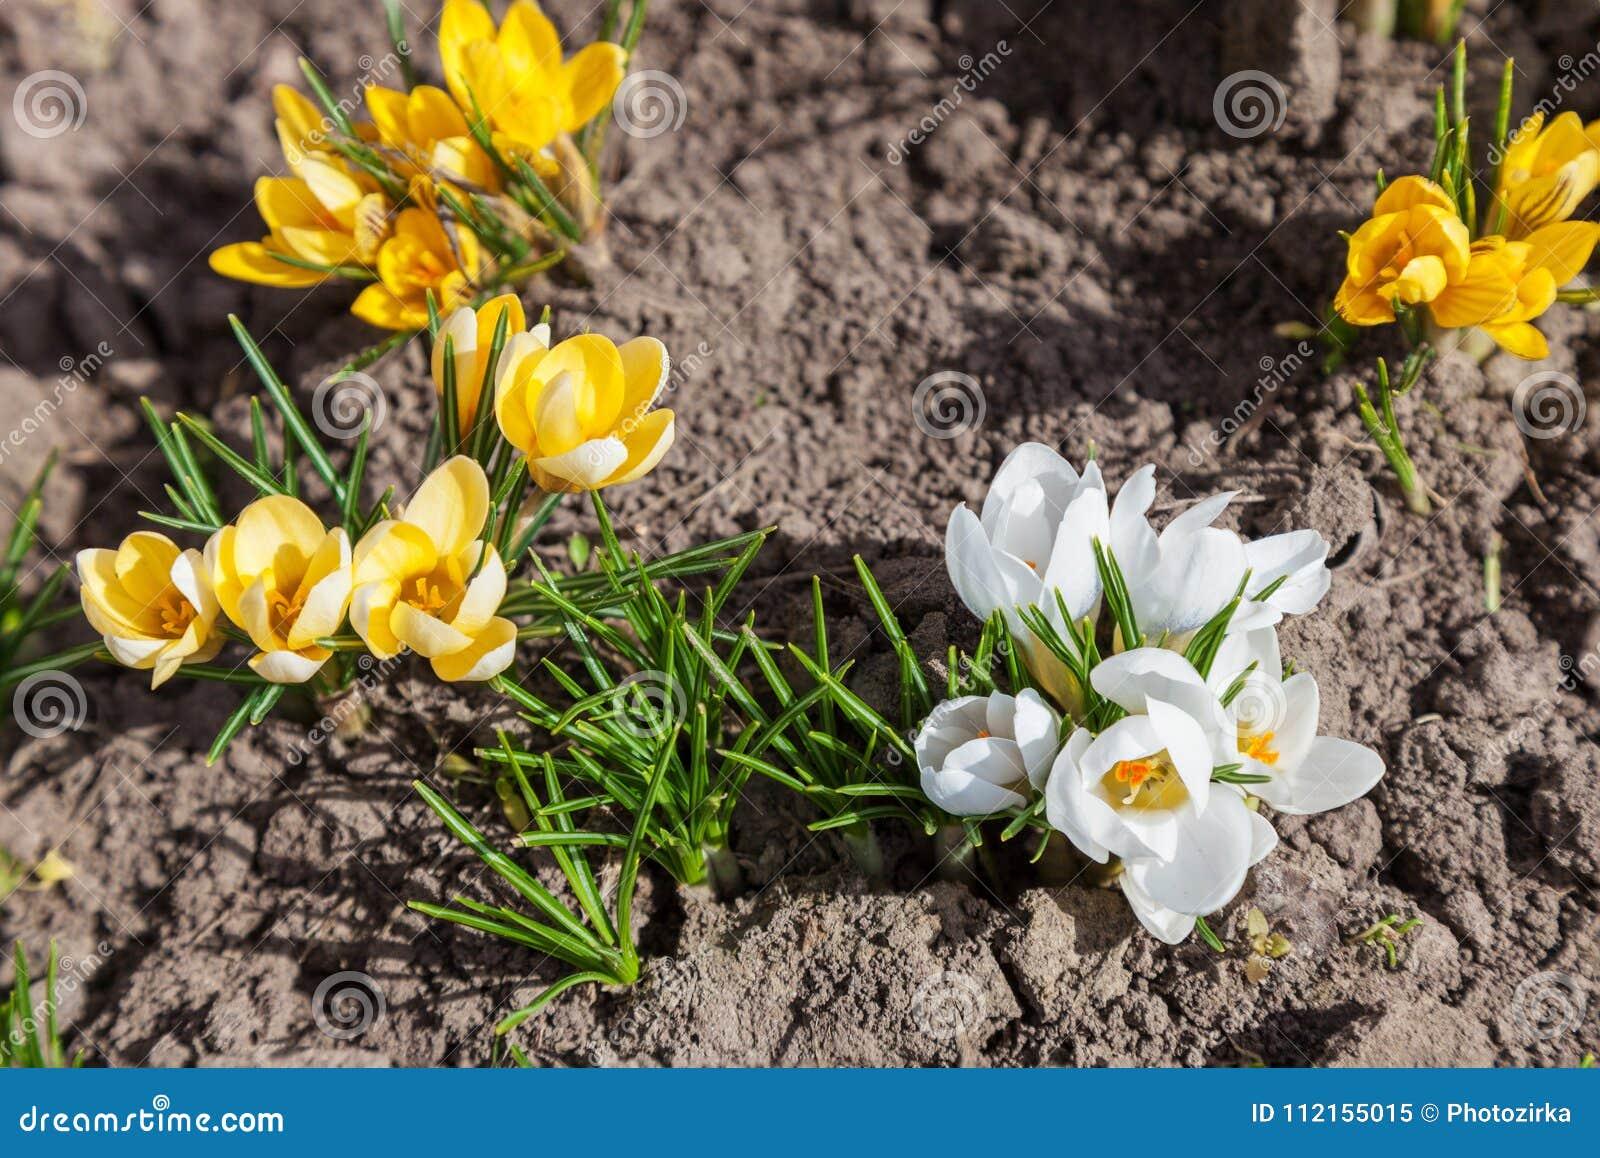 White And Yellow Crocus Flower Stock Image Image Of Flora Crocus